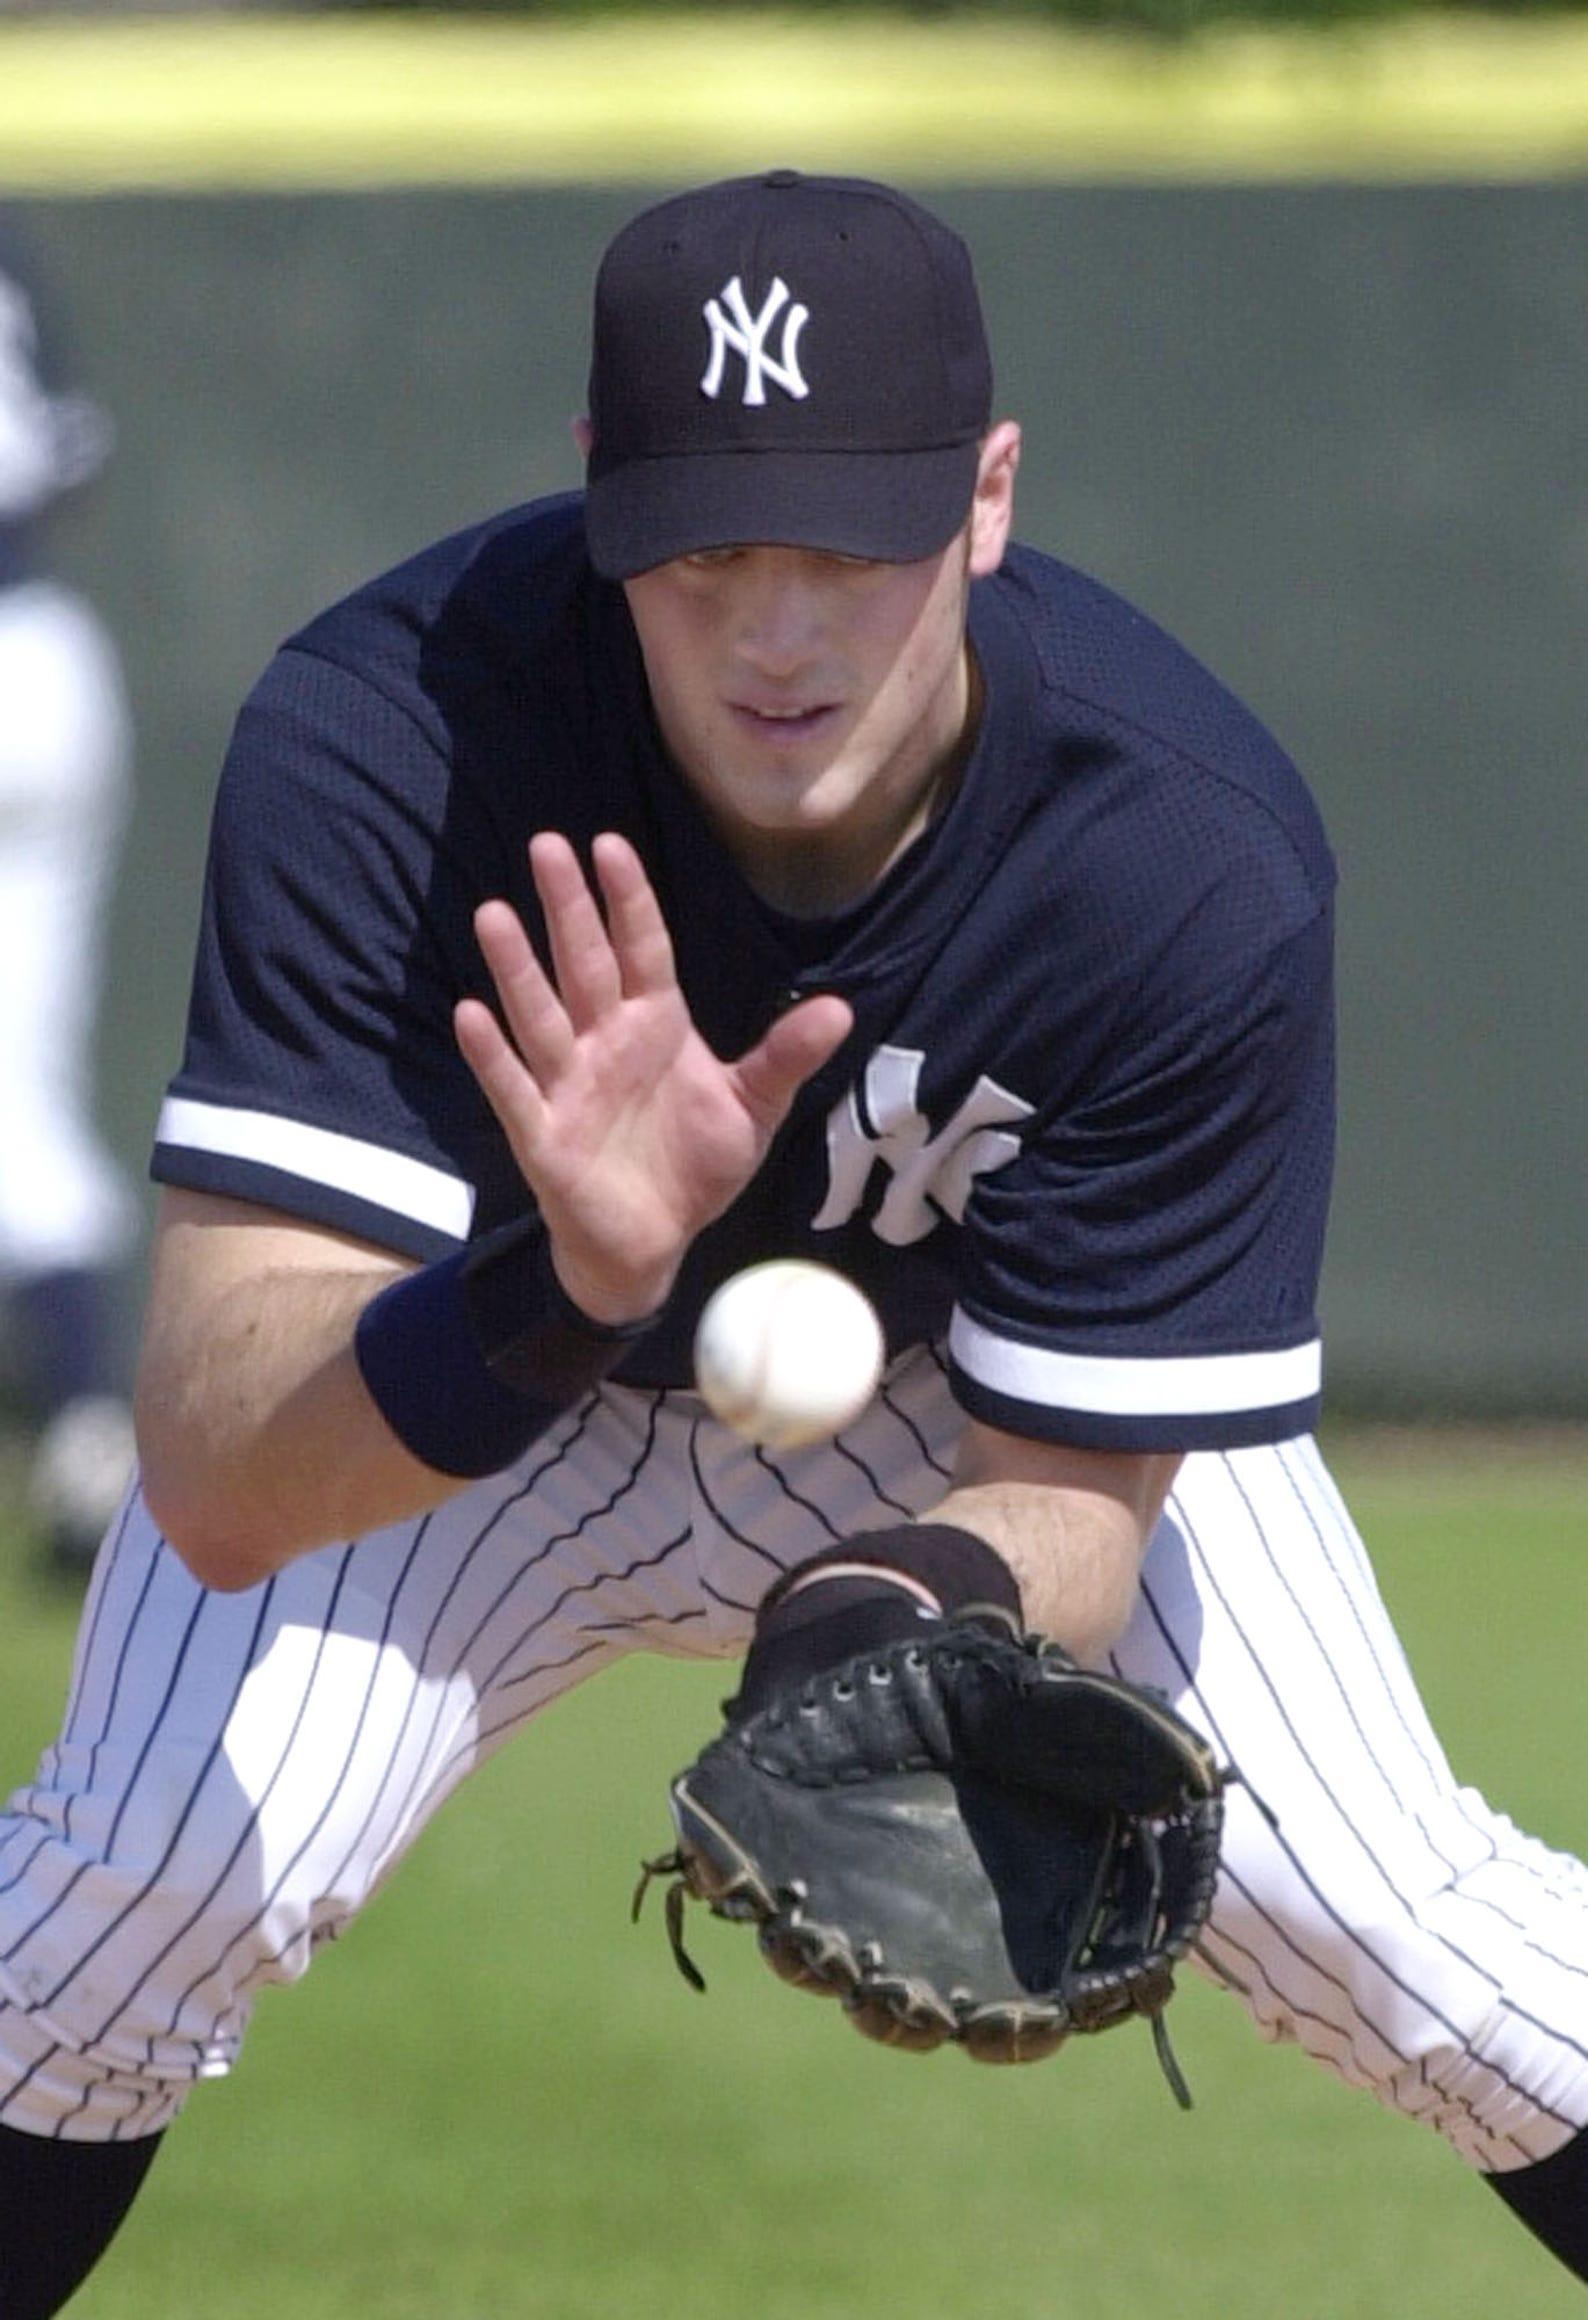 Drew Henson: Houston Texans (2003, 6th round)